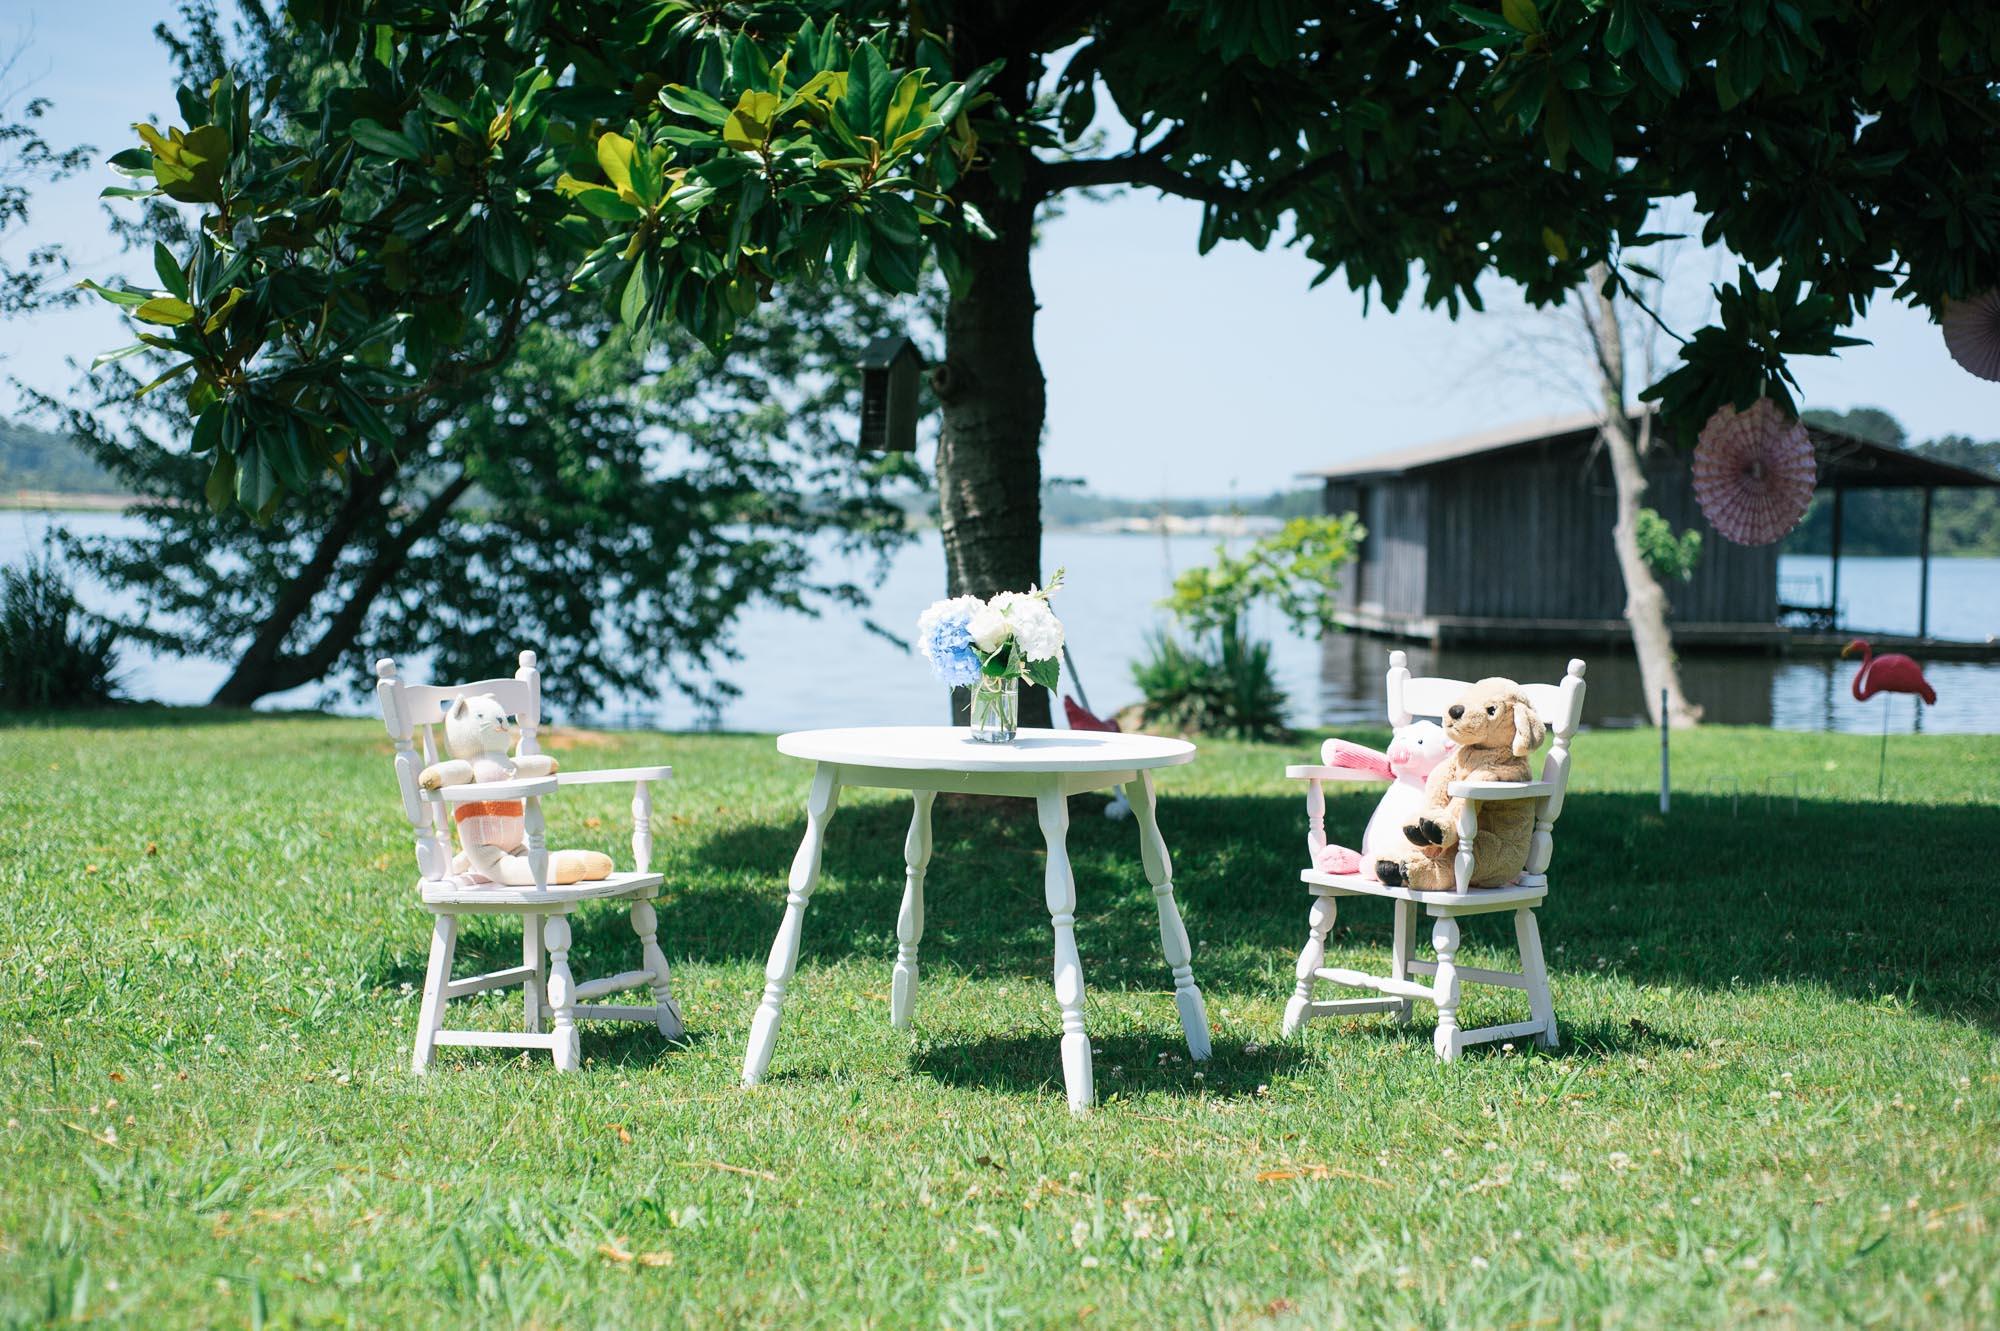 m.newsom-photography-one-year-old-girls-birthday-party-ideas-alice-in-wonderland (5 of 42).jpg